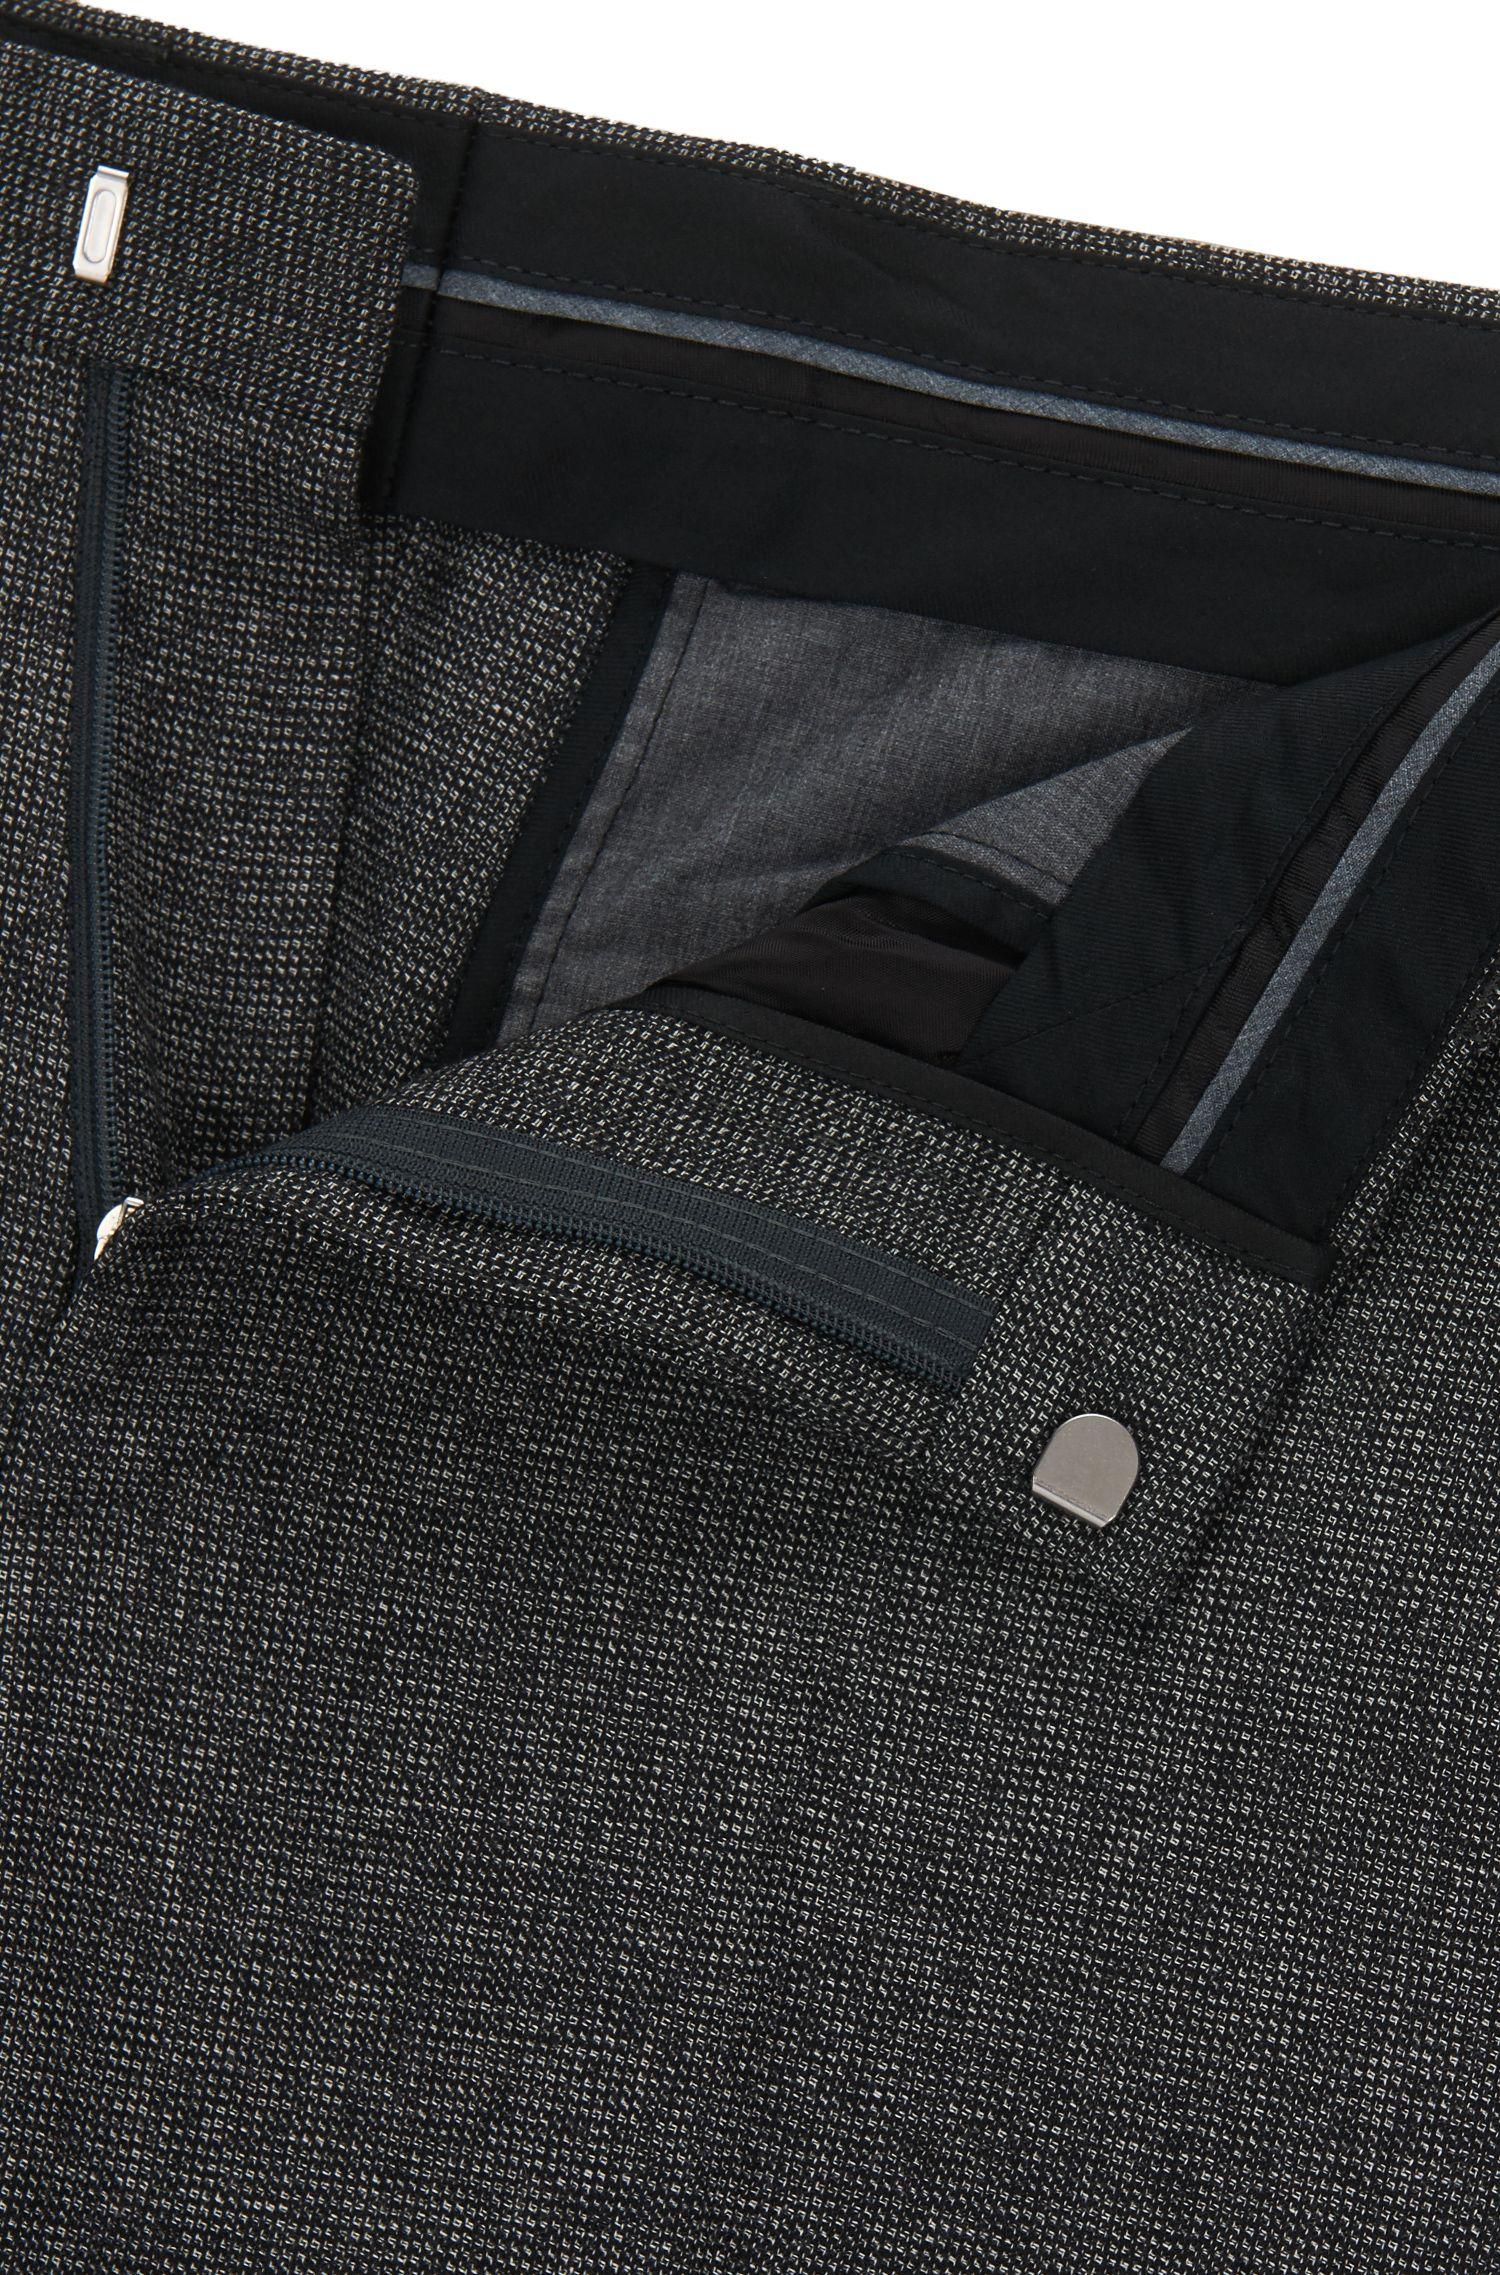 Nailhead Wool Cotton Dress Pants, Slim Fit | Giro, Open Grey